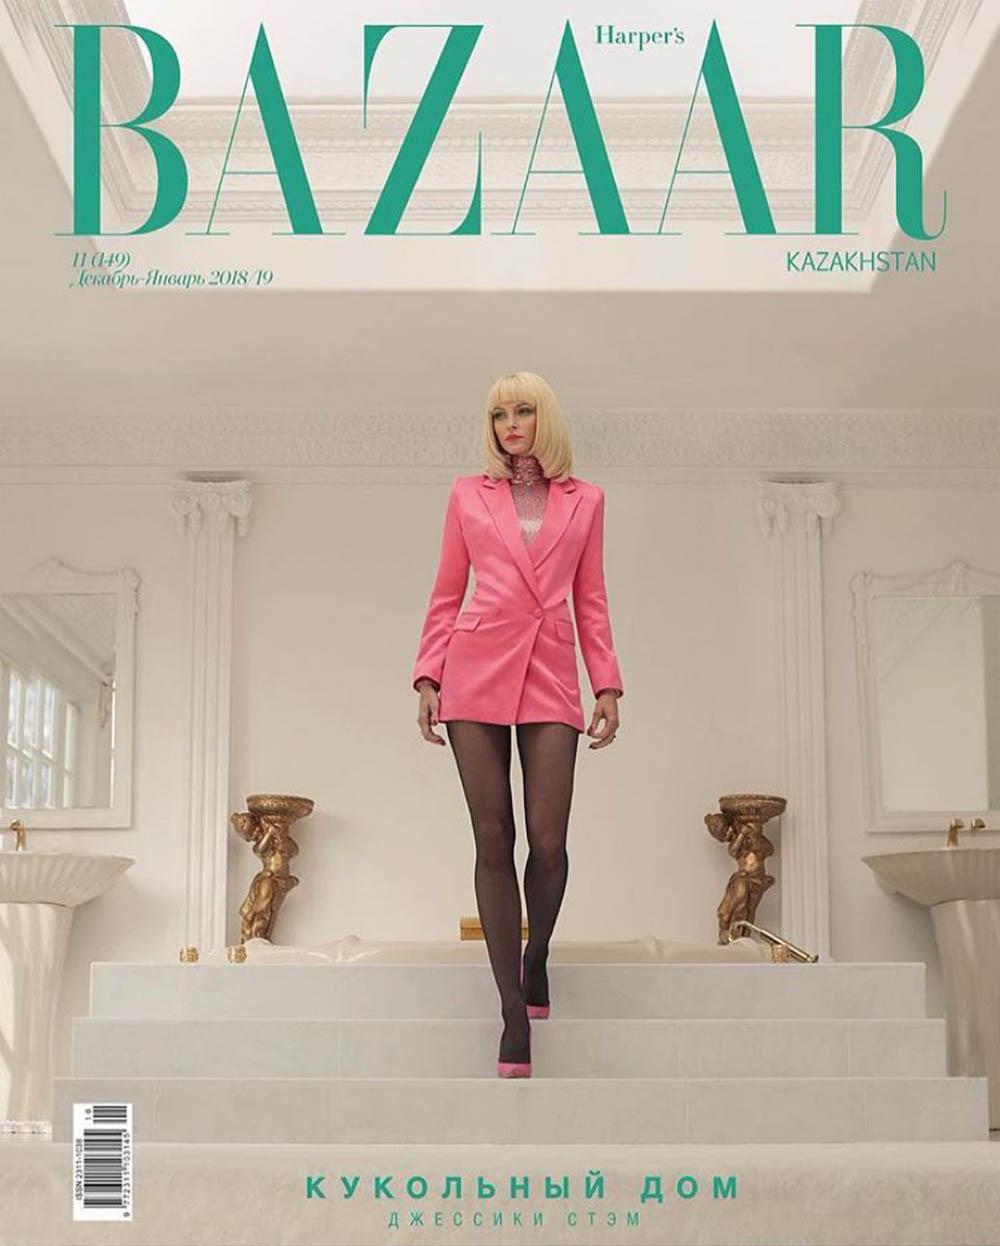 Jessica Stam covers Harper's Bazaar Kazakhstan December 2018 January 2019 by Greg Swales